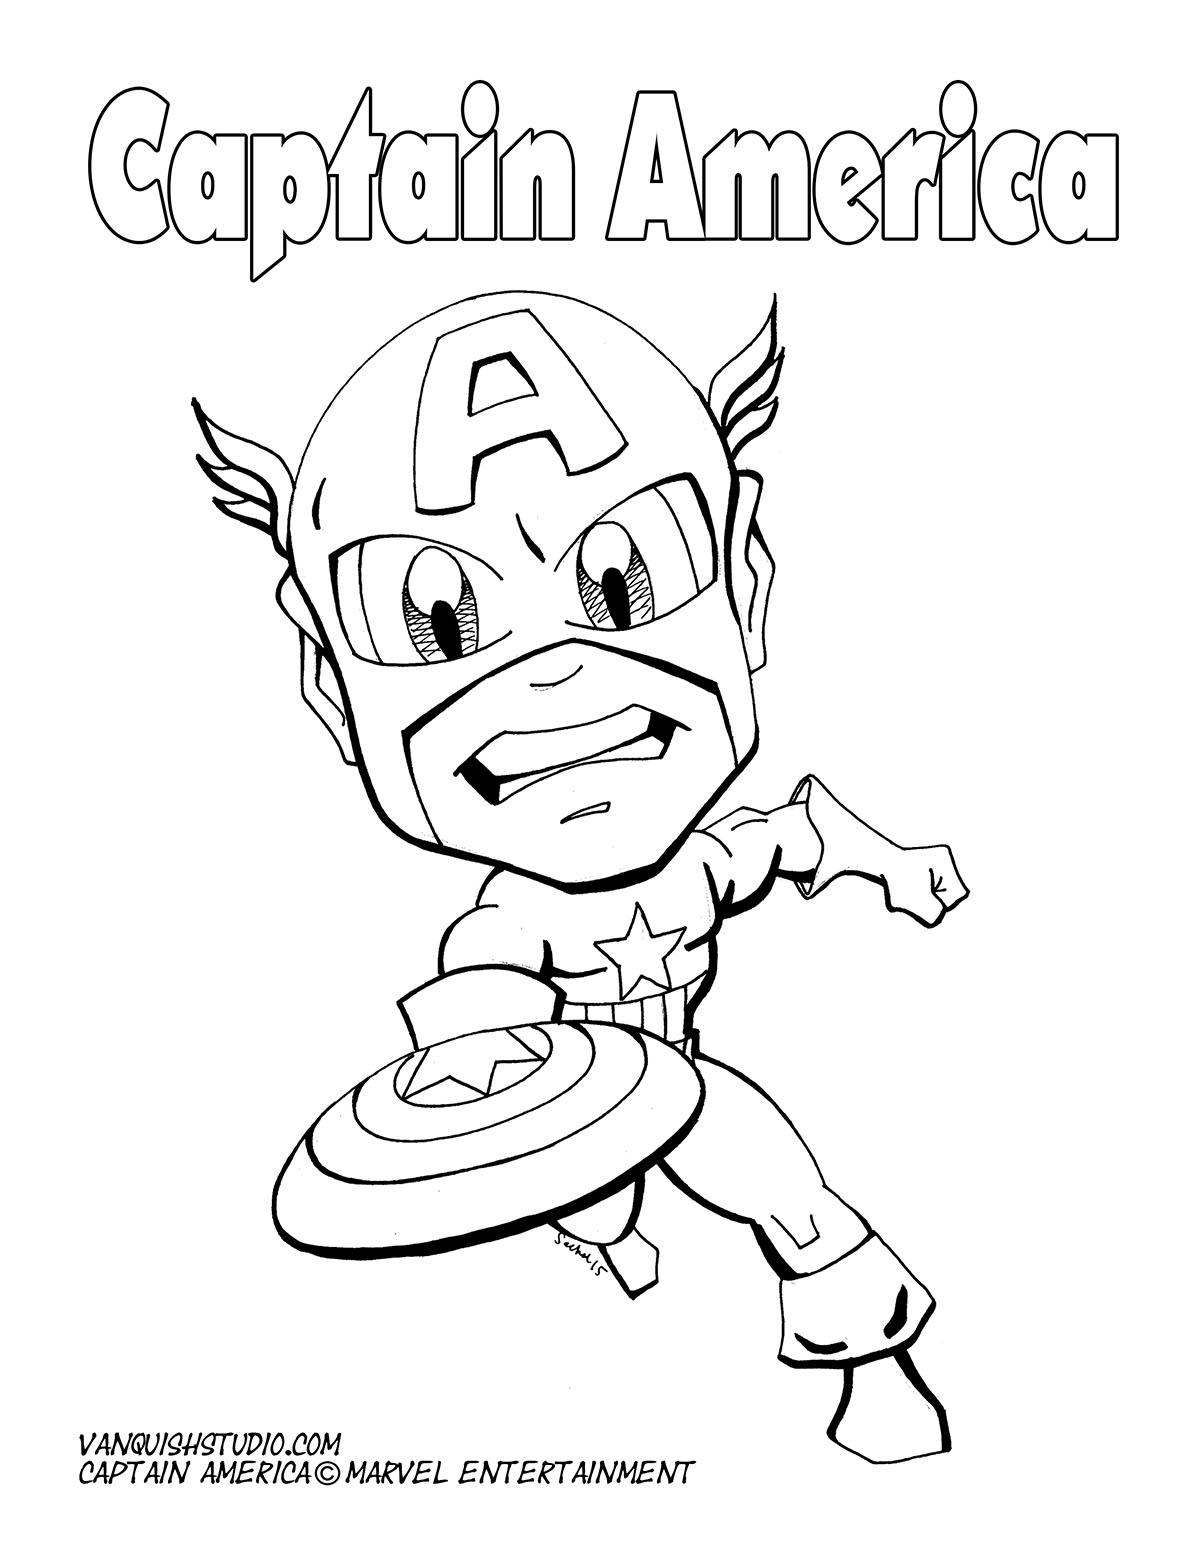 - Captain America Coloring Page Vanquish Studio